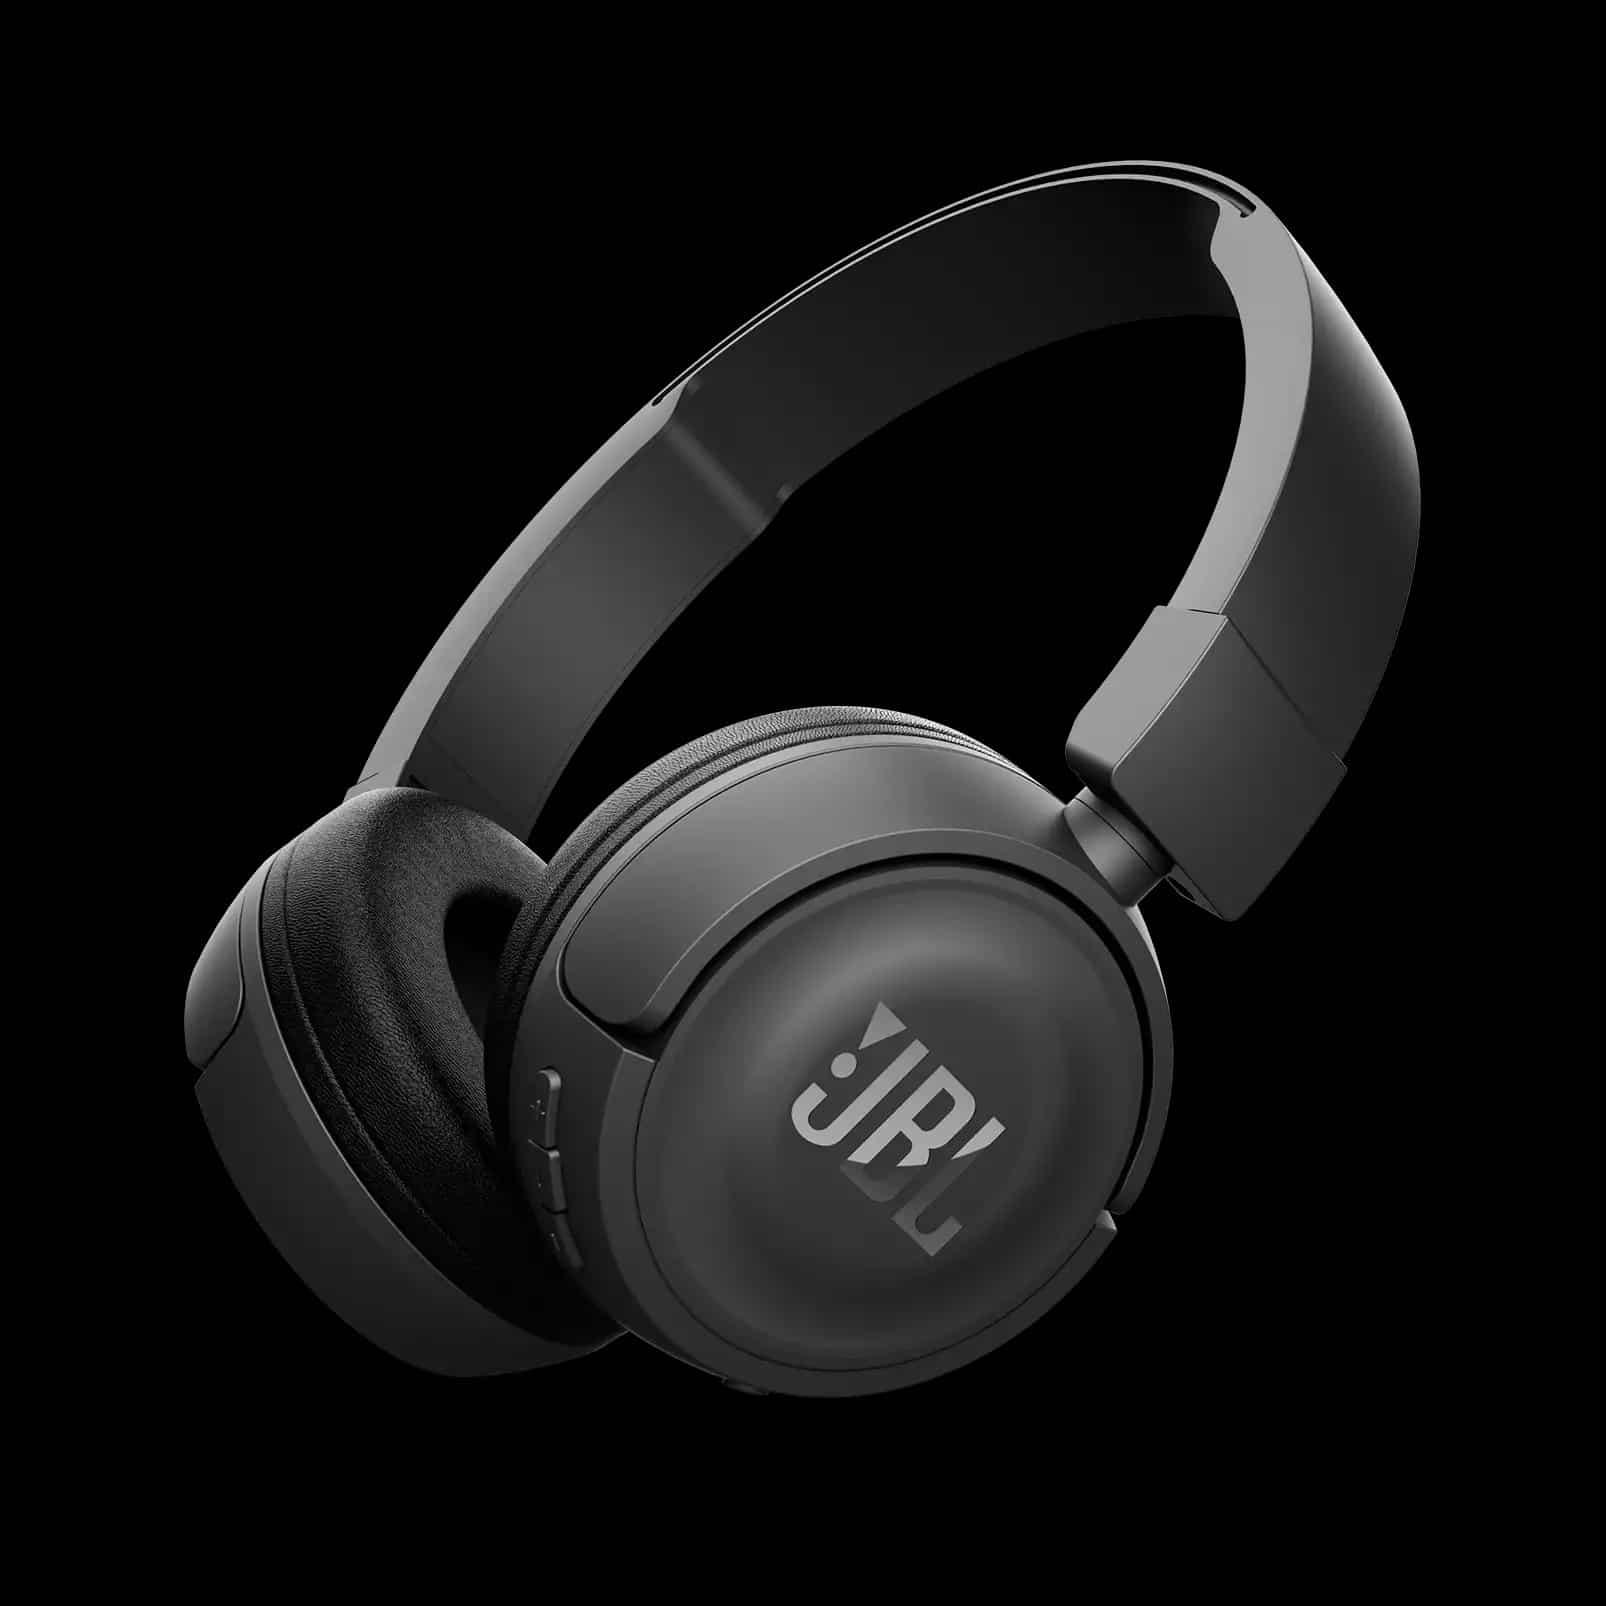 JBL-Wireless-Headphone